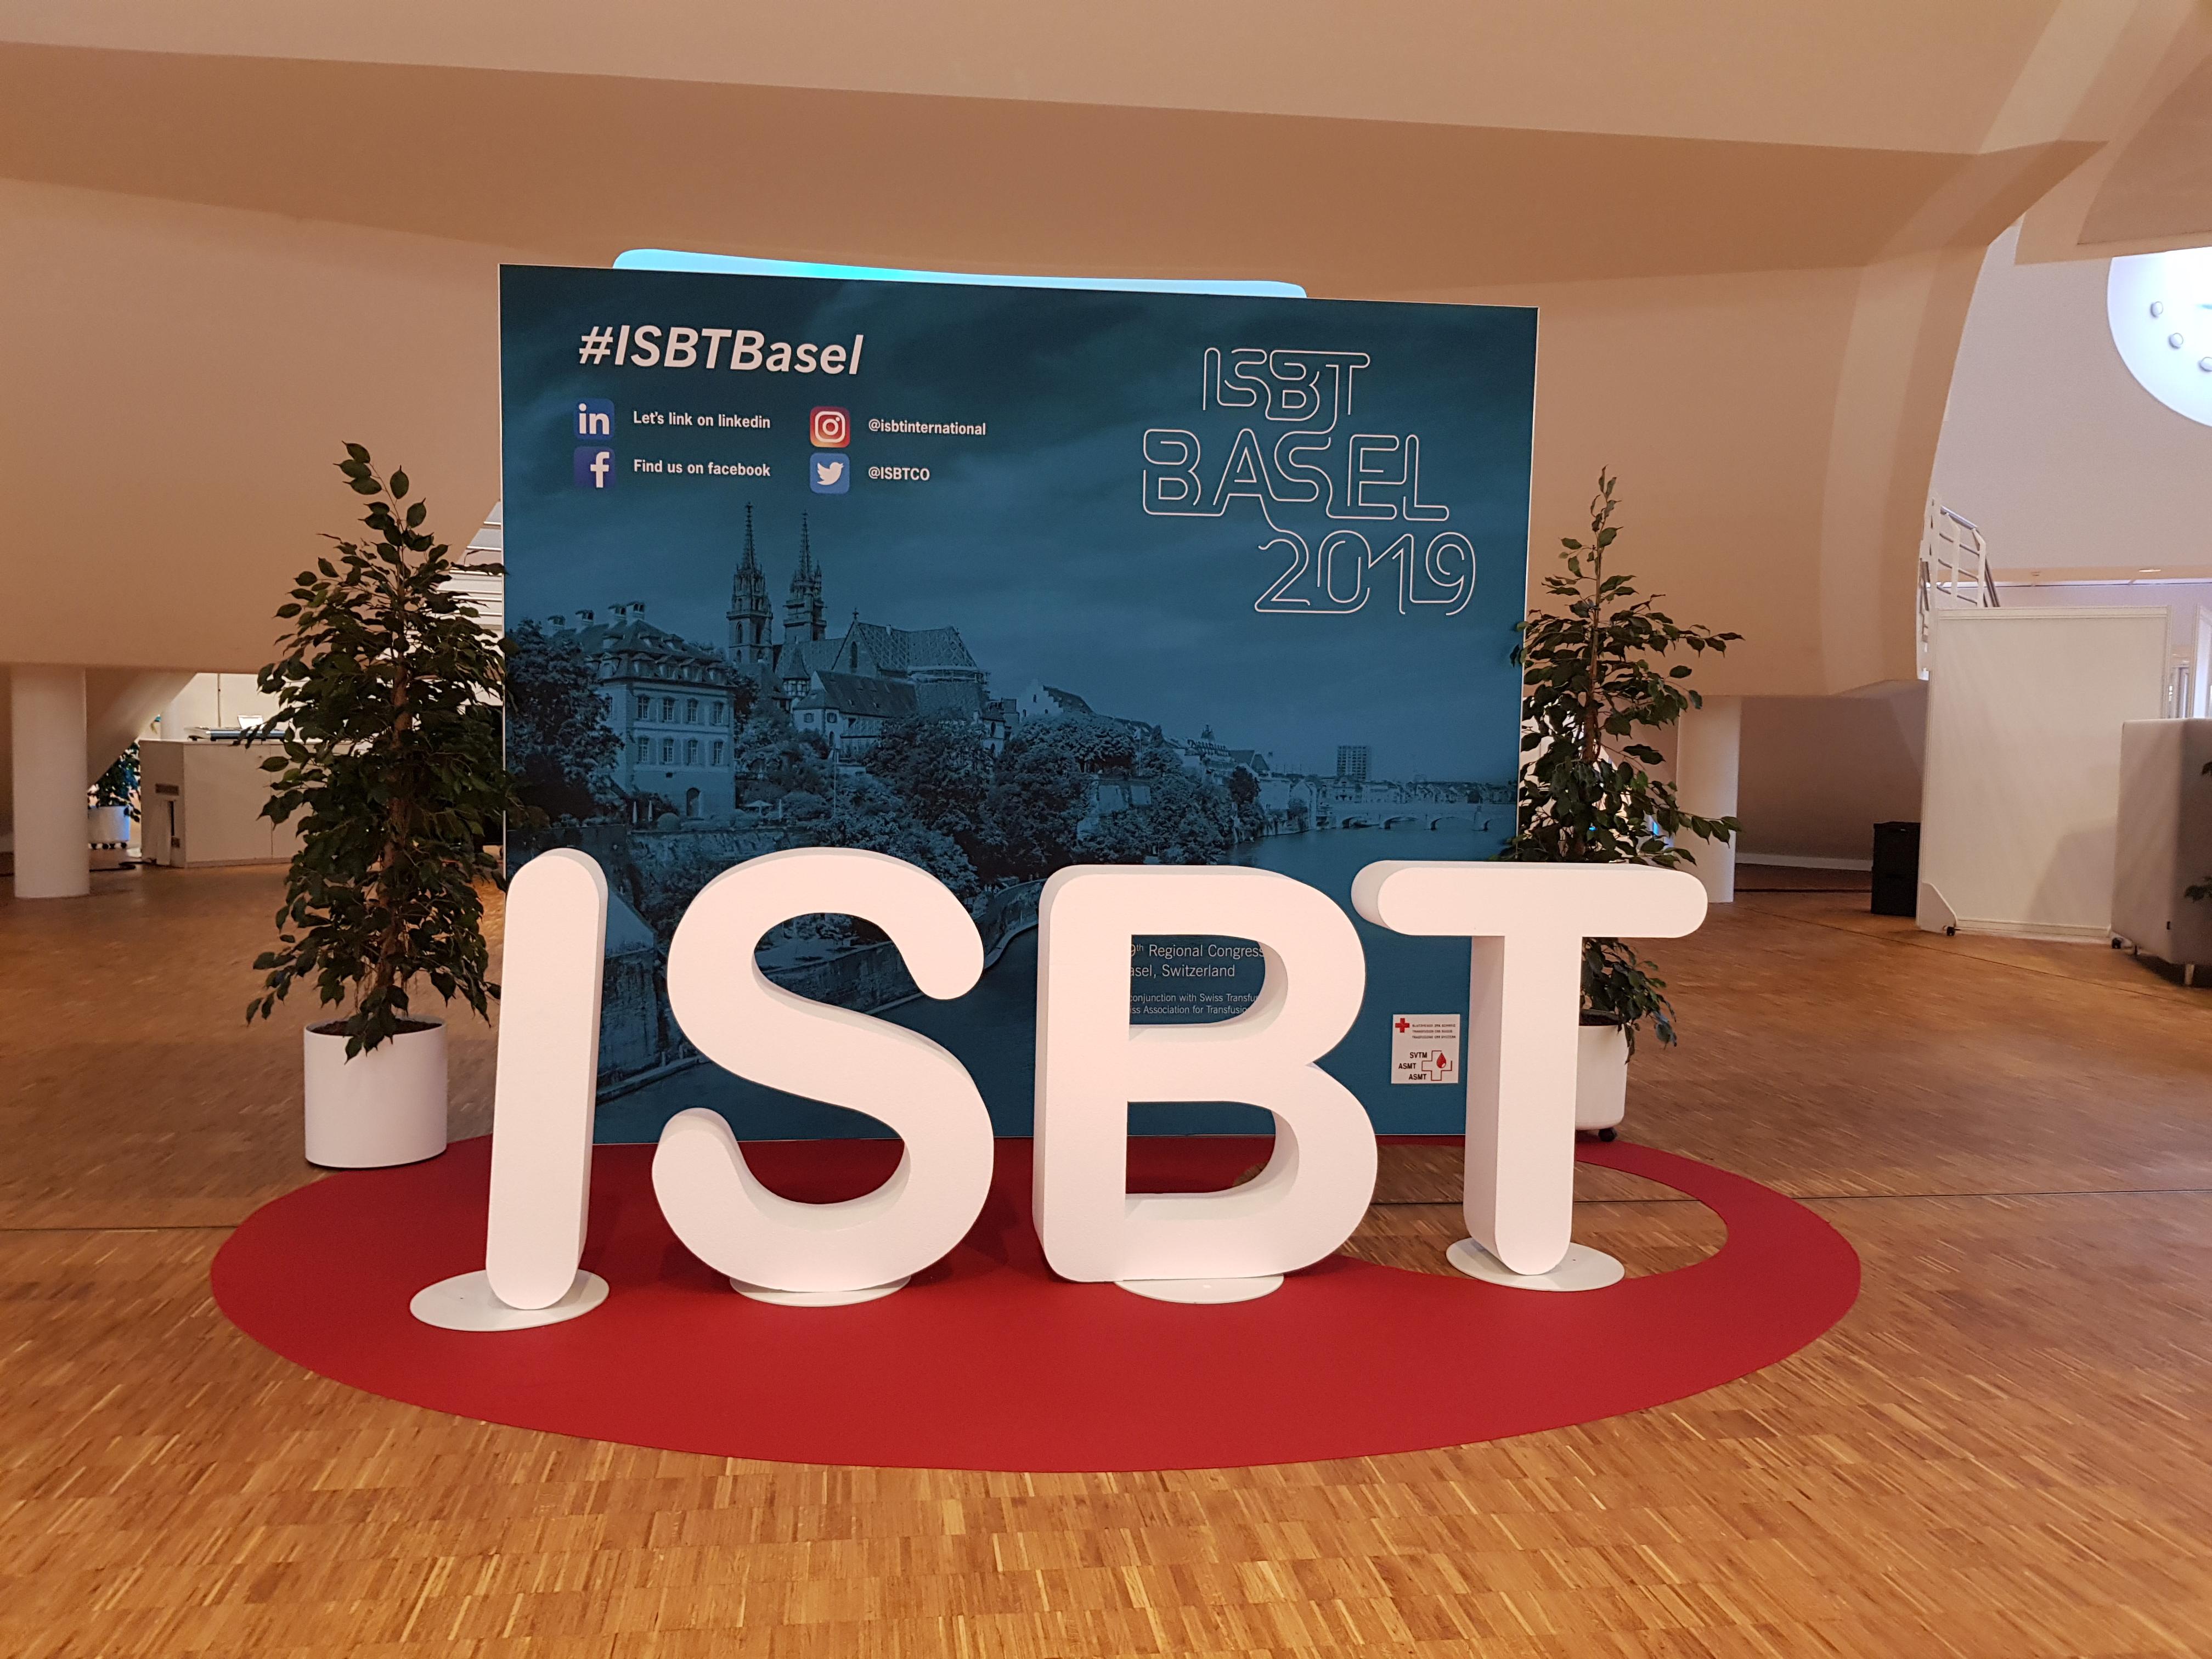 Photowall ISBT Basel 2019